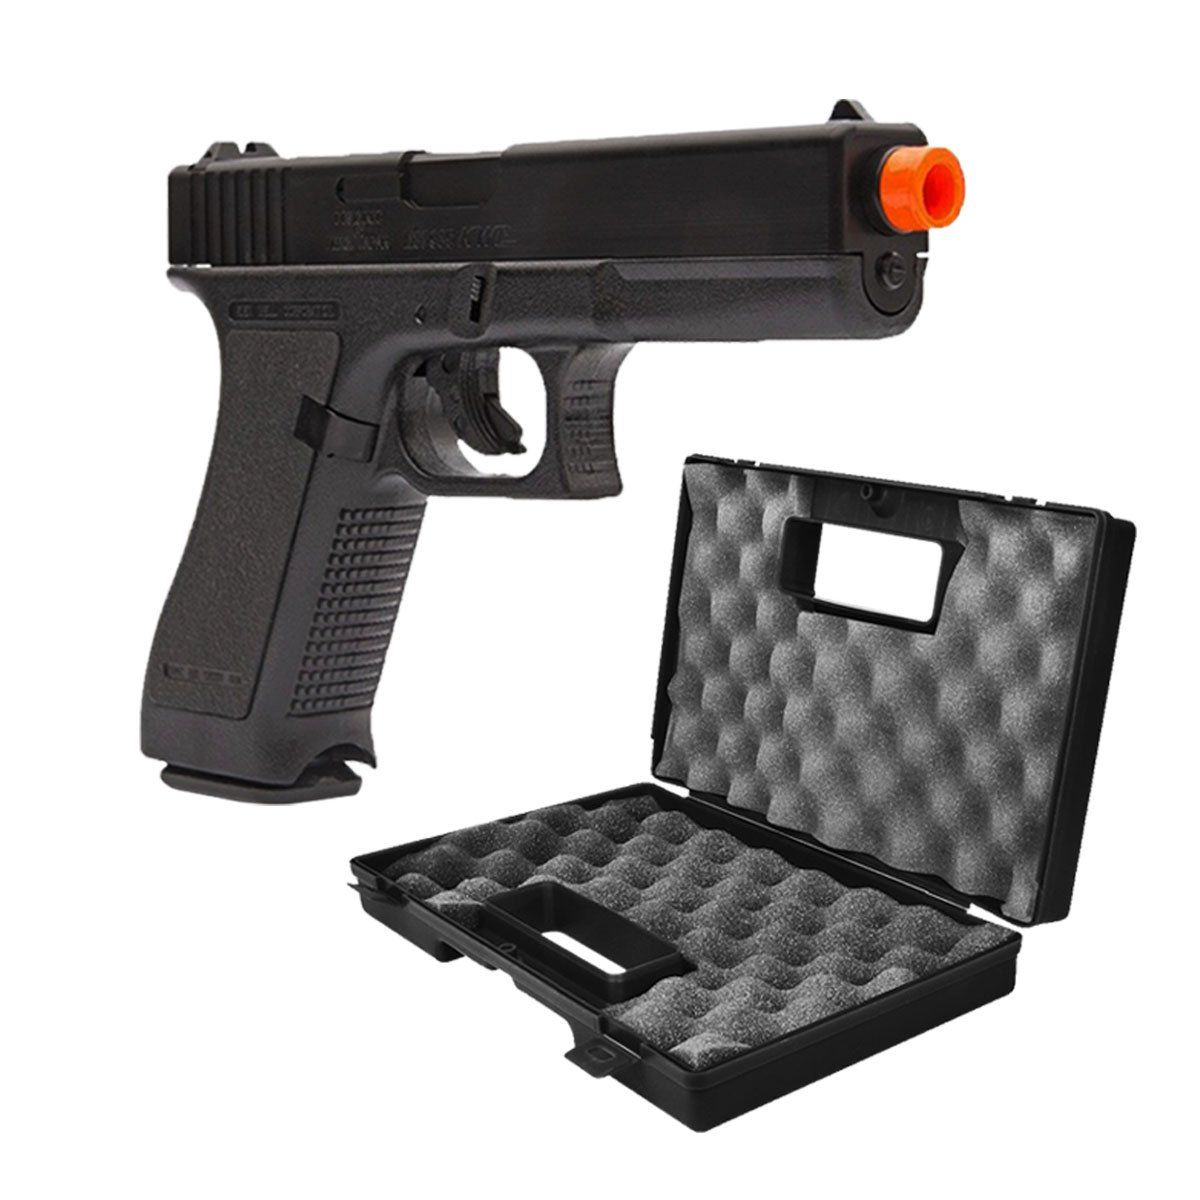 Pistola de Airsoft KWC Glock G7 Spring 6mm + Maleta